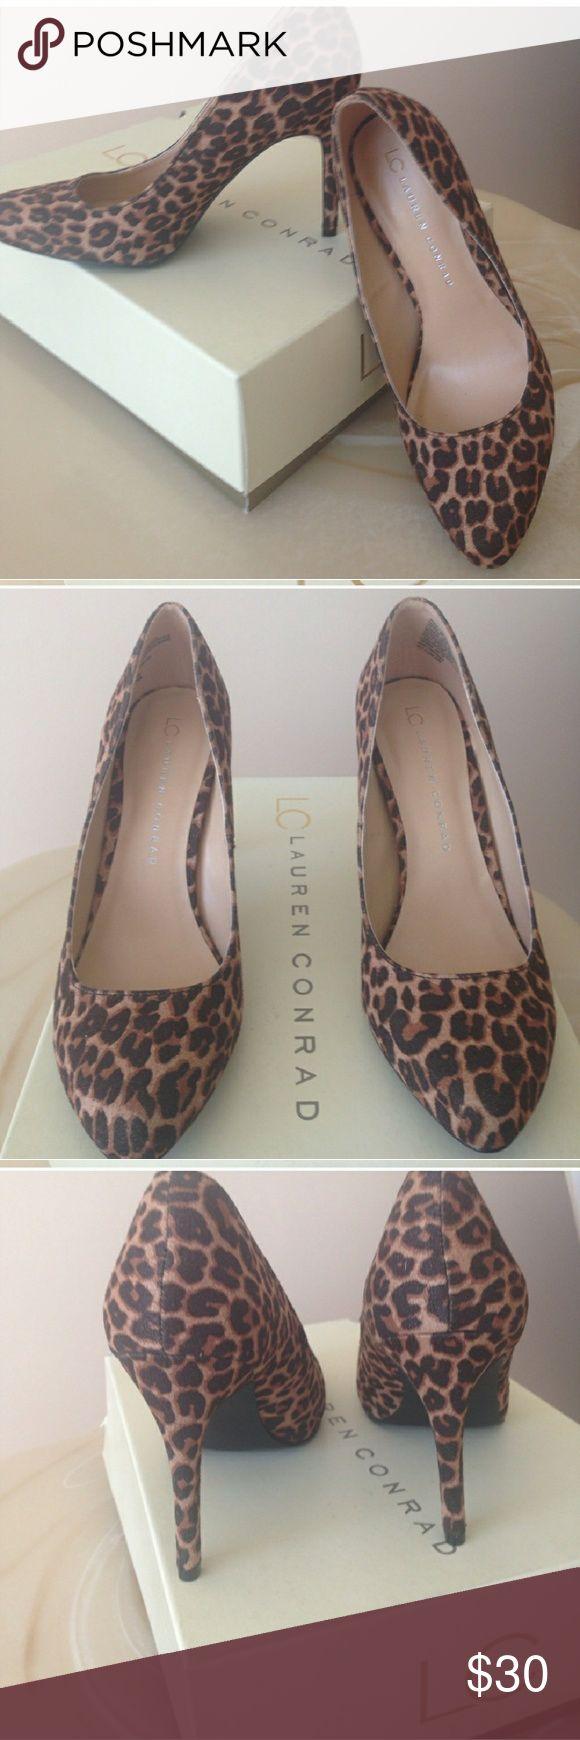 LC Lauren Conrad cheetah heels Brand new heels Women's size 8 LC Lauren Conrad brand Cheetah print design  Most offers will be considered   Save 15% on all 2+ bundles LC Lauren Conrad Shoes Heels